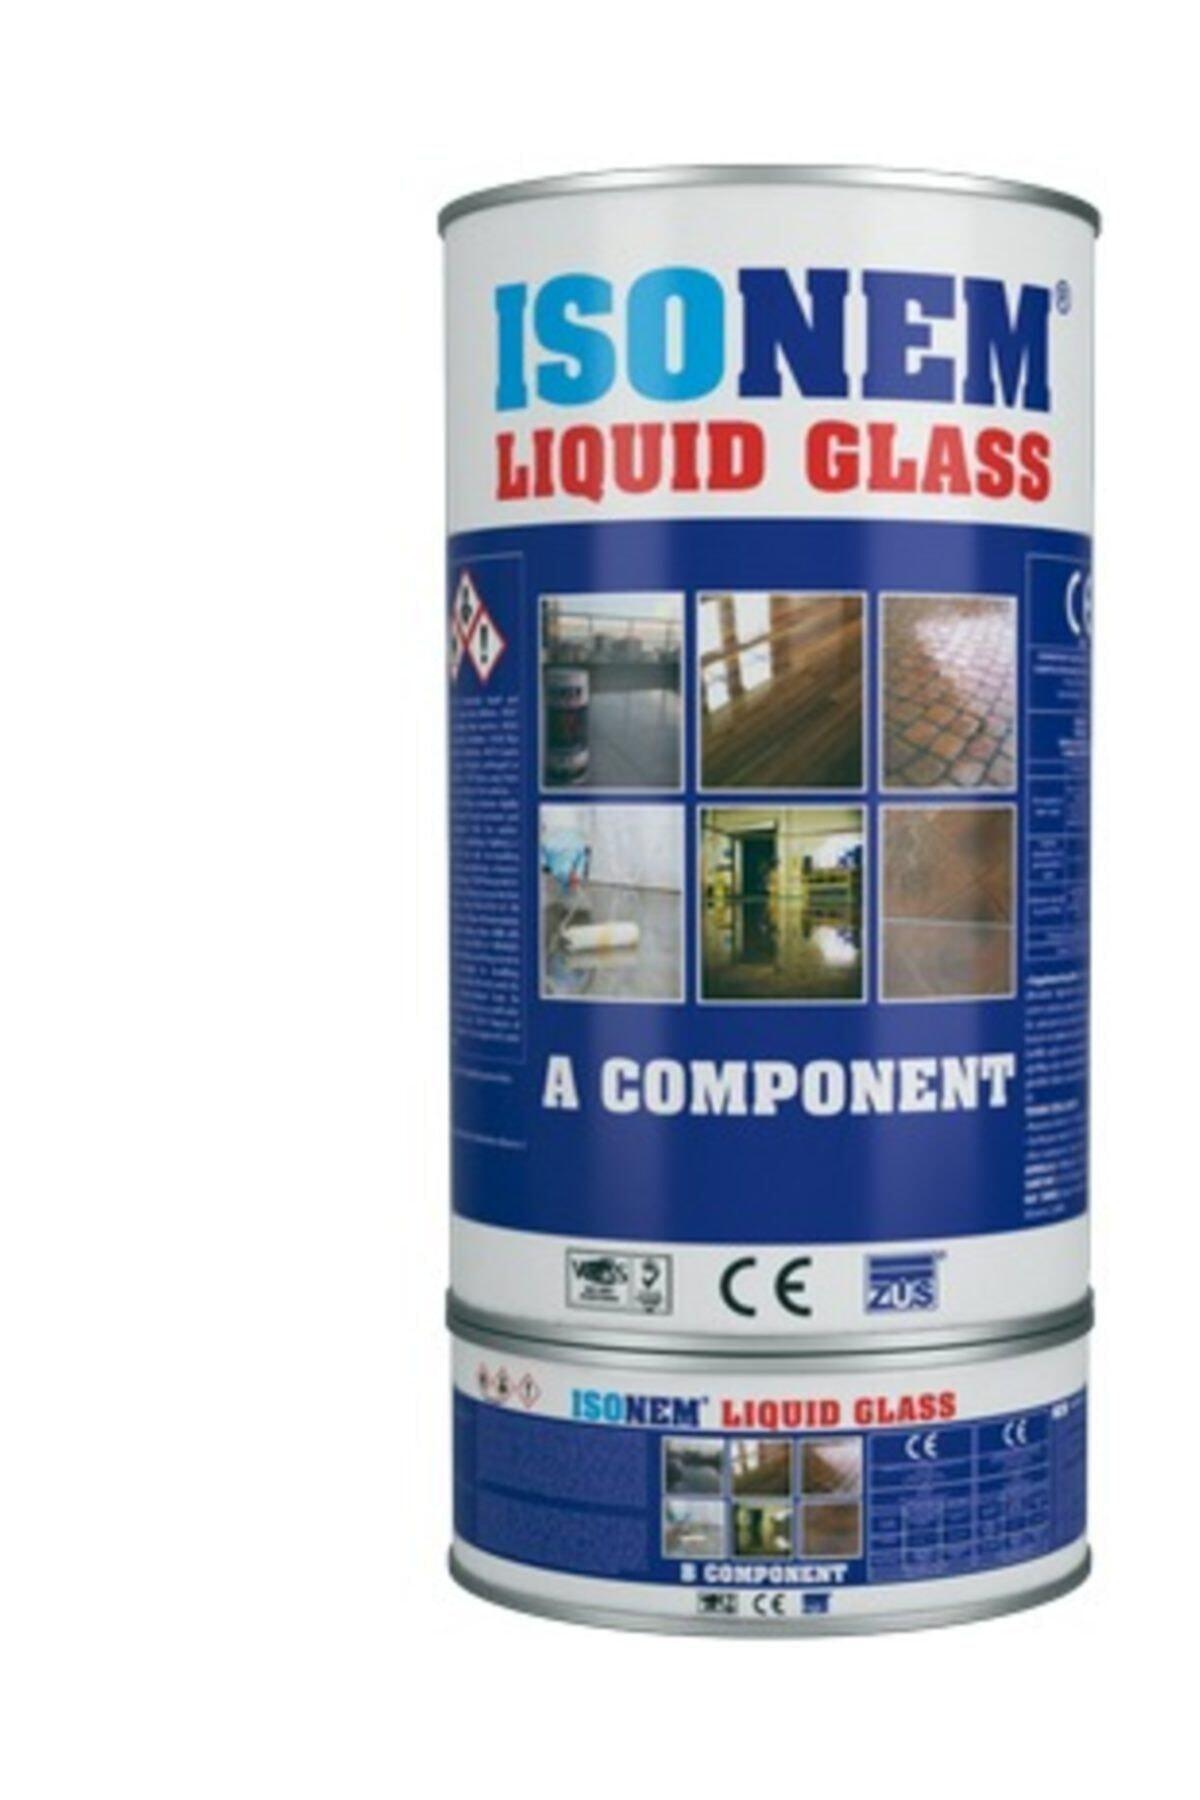 Isonem Lıquıd Glass Sıvı Cam – Şeffaf Ve Parlak Su Izolasyonu 2 Kg 1